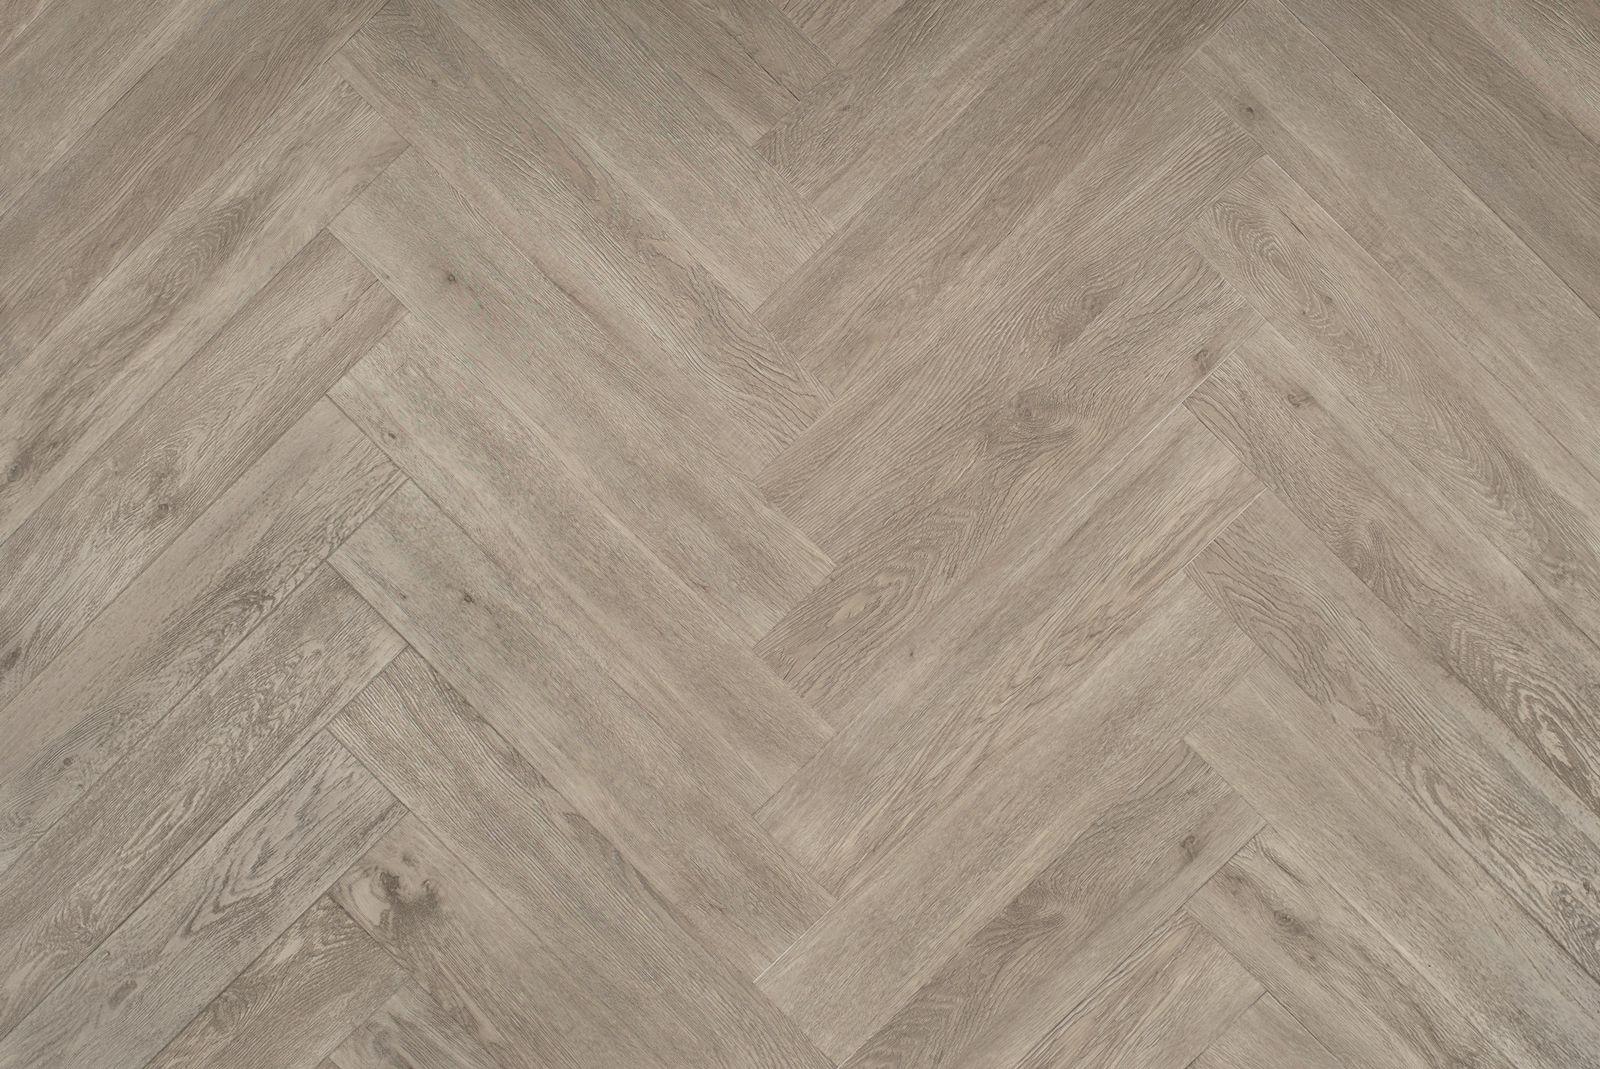 Witte visgraat vloer vernieuwde visgraat vloeren van floer floer